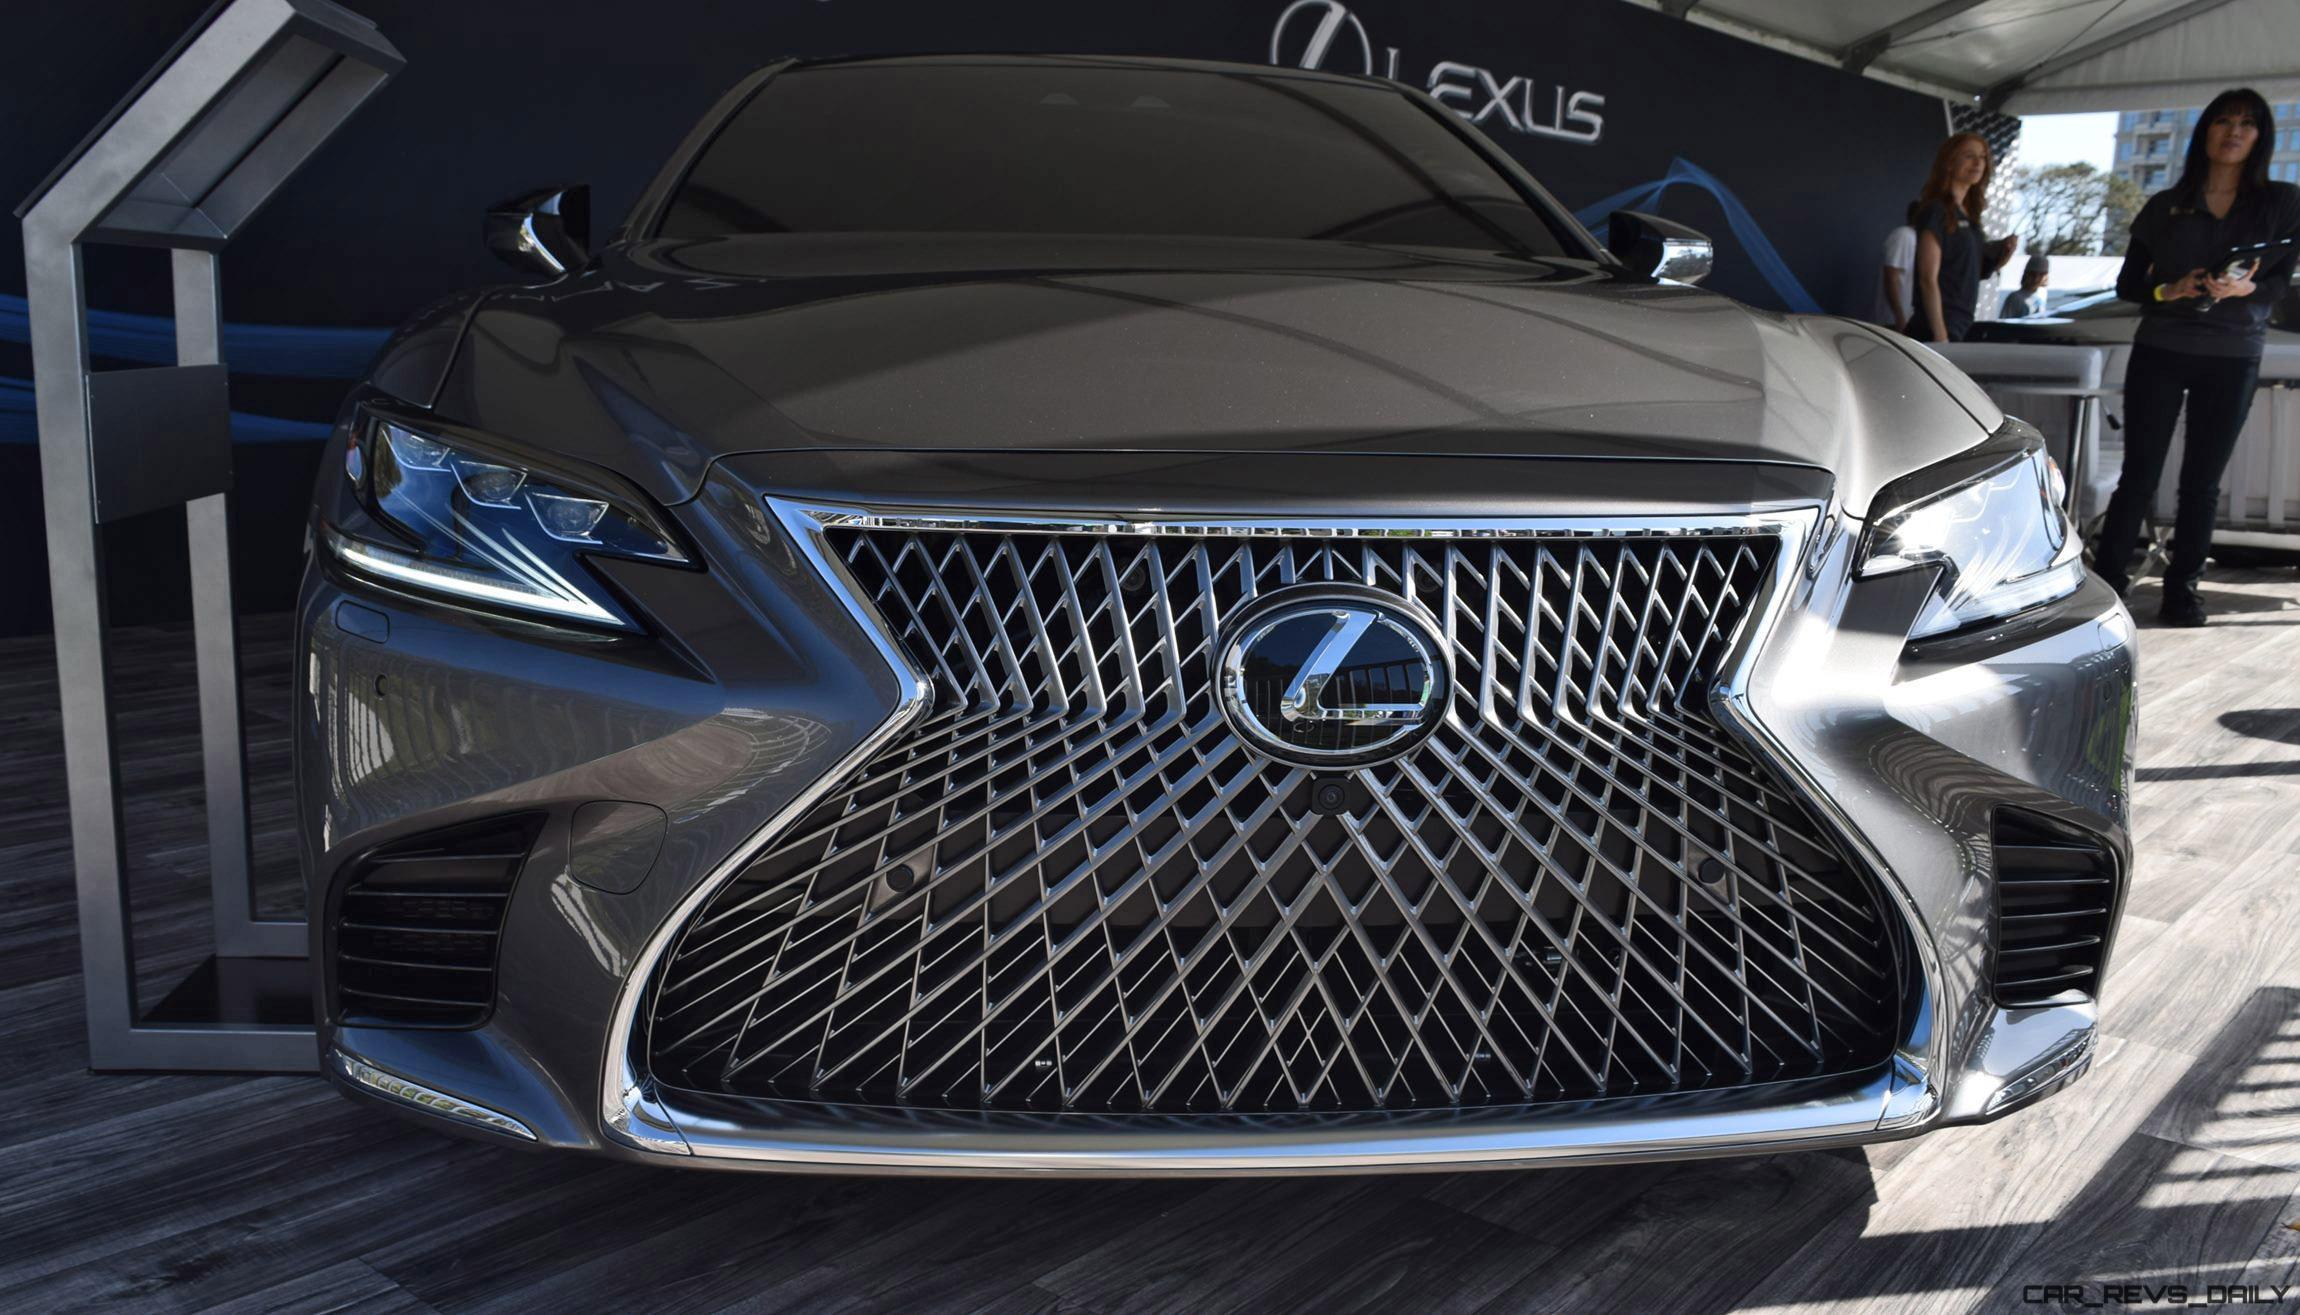 Design Analysis 2018 Lexus LS500 at Amelia Island Concours [23